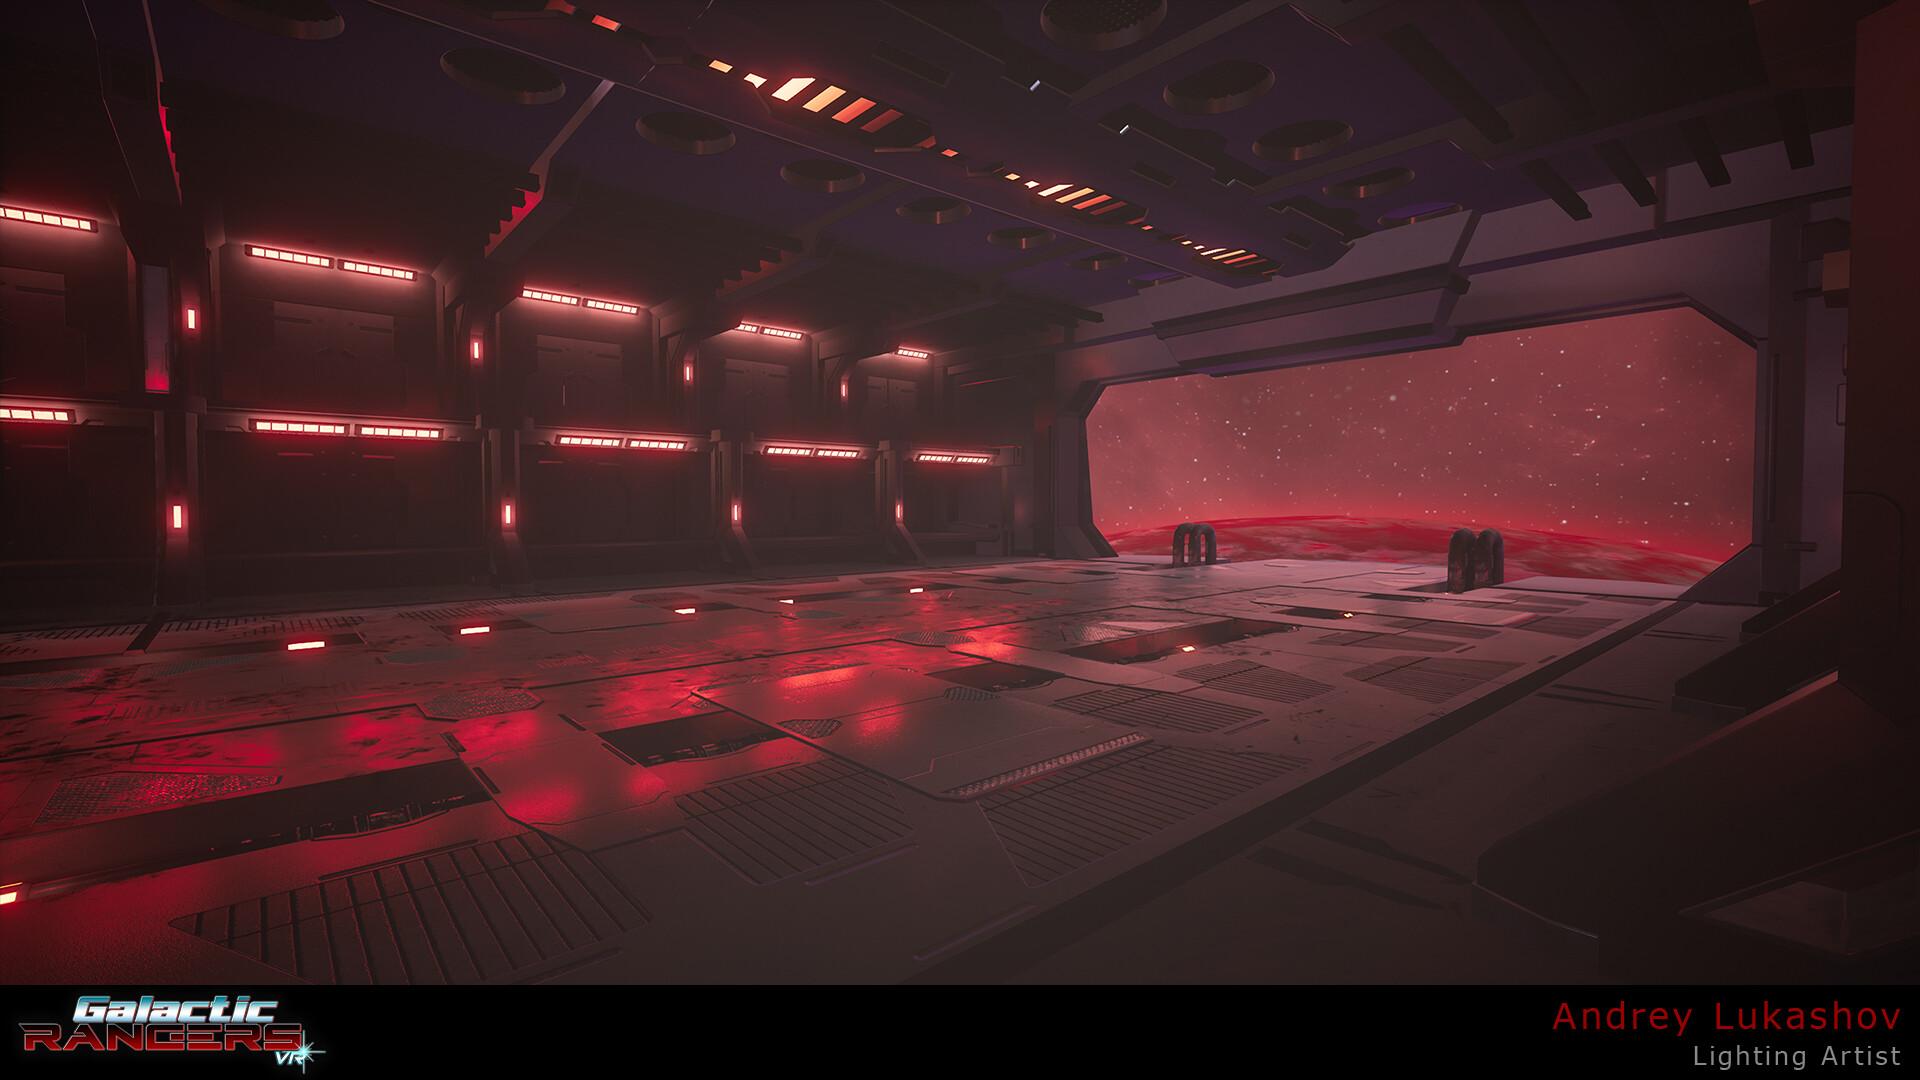 Andrey lukashov hangar lightred 03